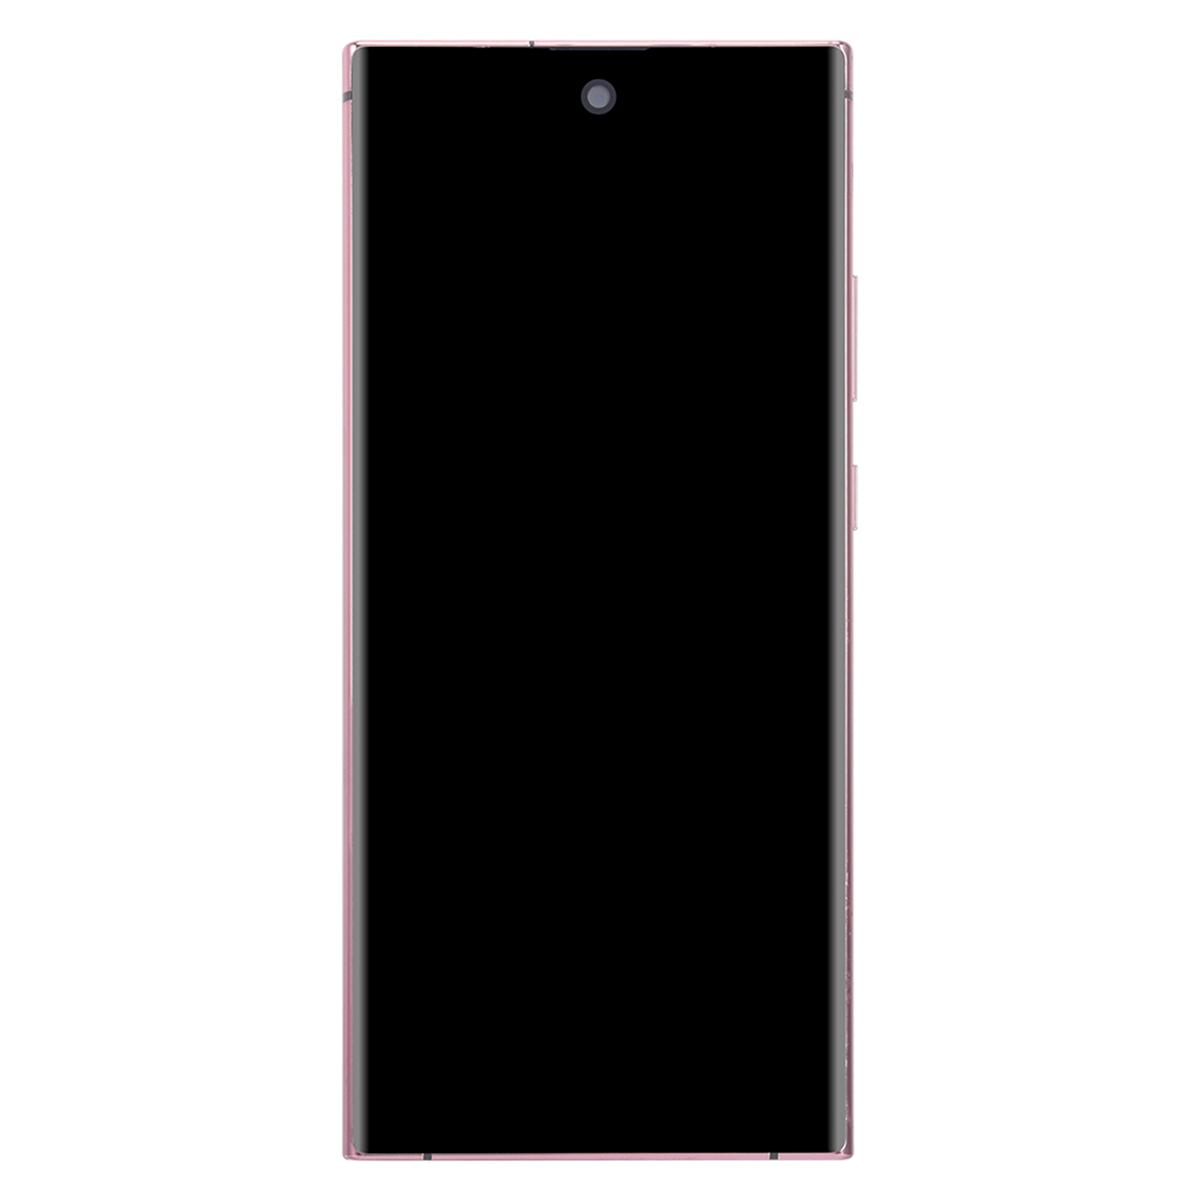 6.9 6.8 6.7 pollici Punch-Hole Schermo intero S21U 21+ Ultra 5G Smart Phone N20U S20U 4G LTE 3G WCDMA Octa Core 2 GB 16 GB Android 11 Viso ID IF La fingerprint 13MP Camera Smartphone 512 GB